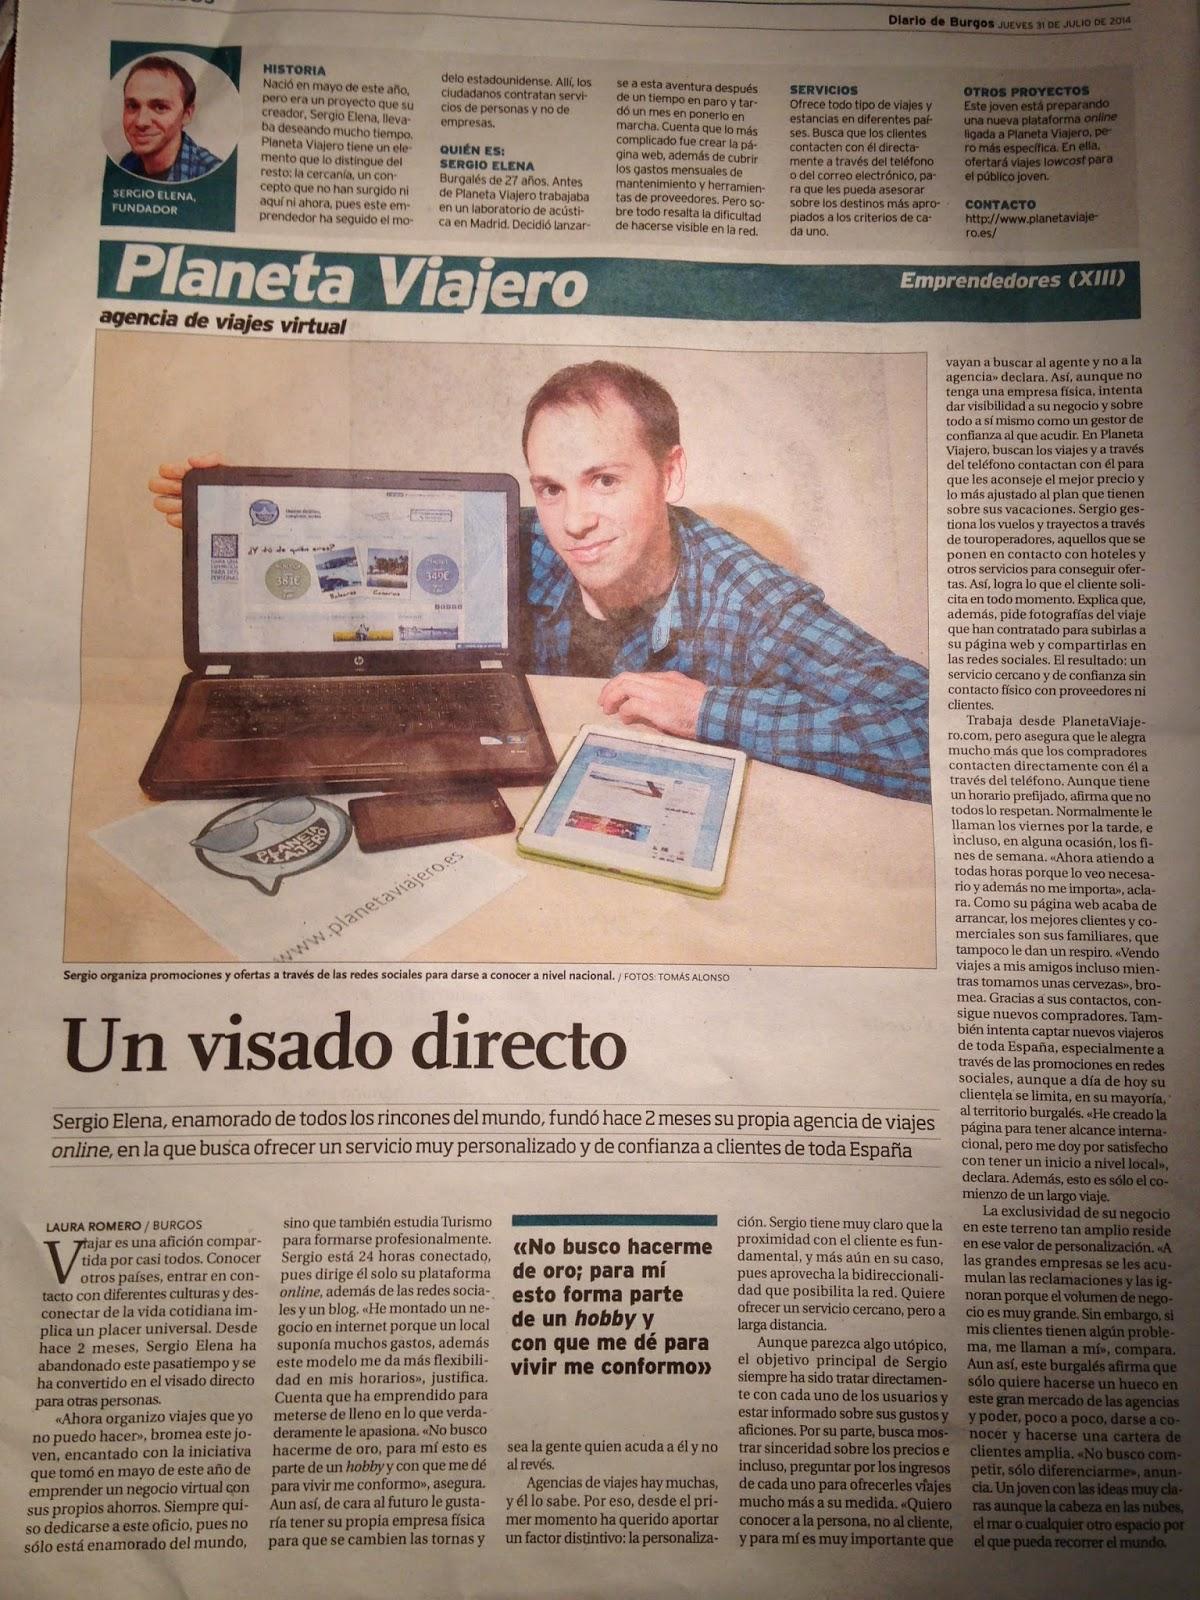 Planeta Viajero en el Diario de Burgos